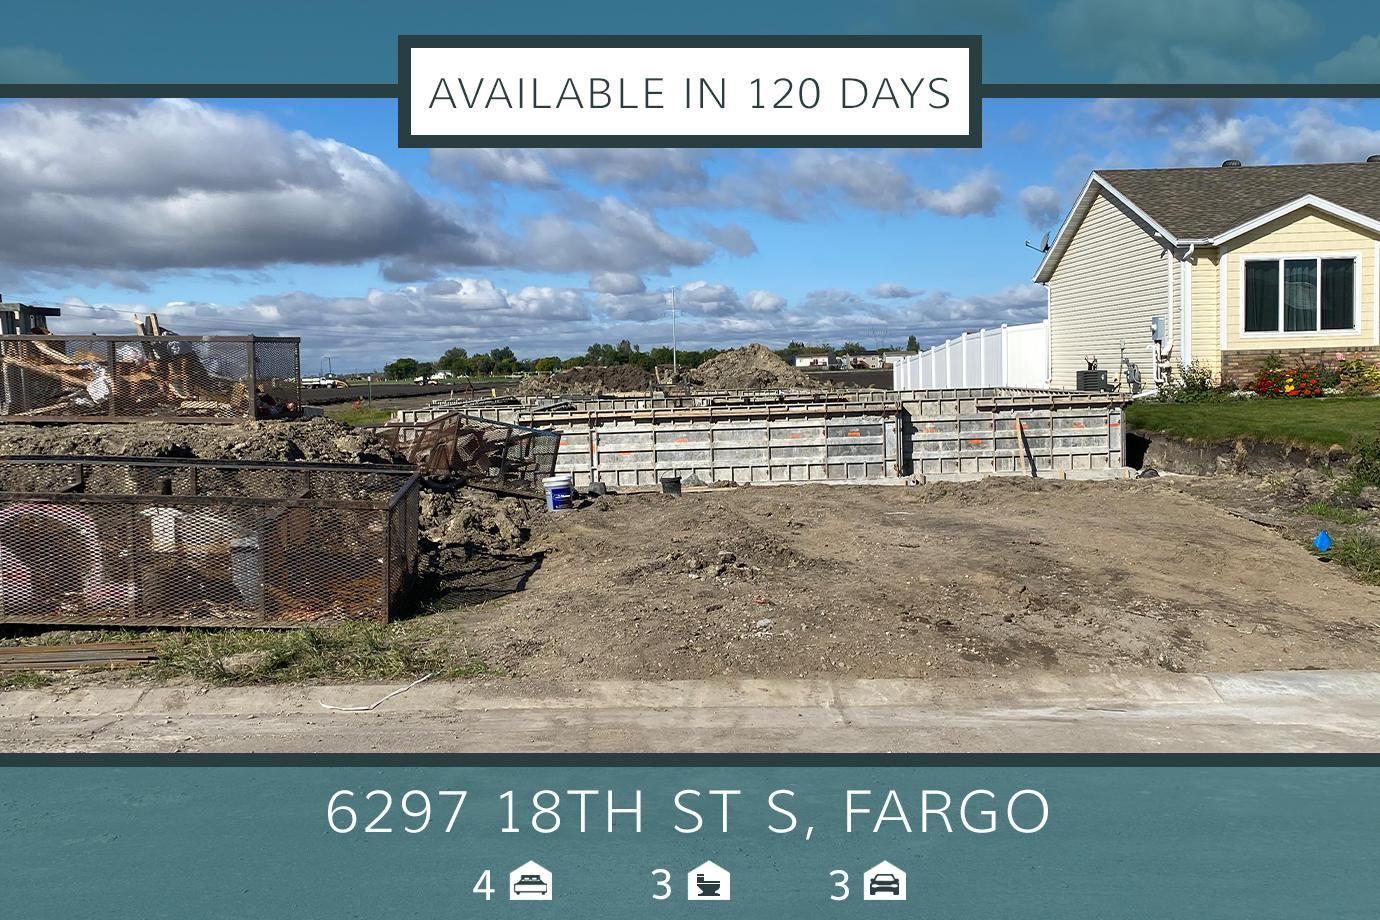 6297 18 Street S, Fargo, ND 58104 - #: 20-5995